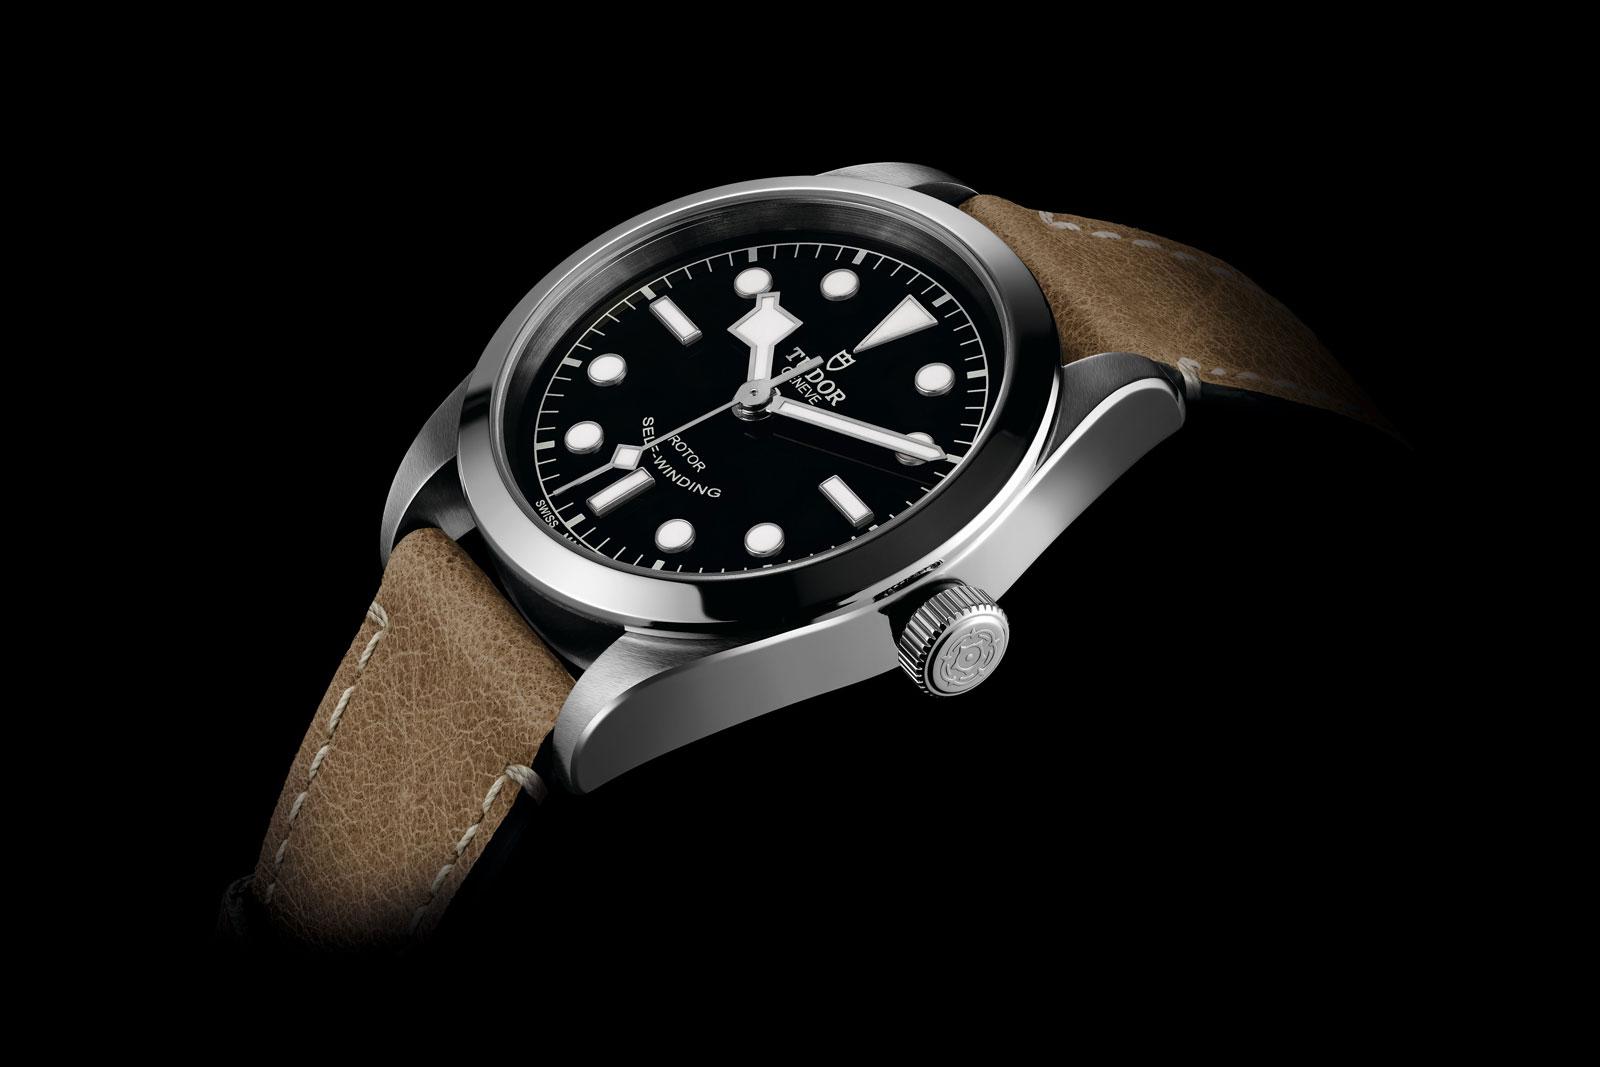 m79500-0002_black_leather_beige_det1_amb_xxl